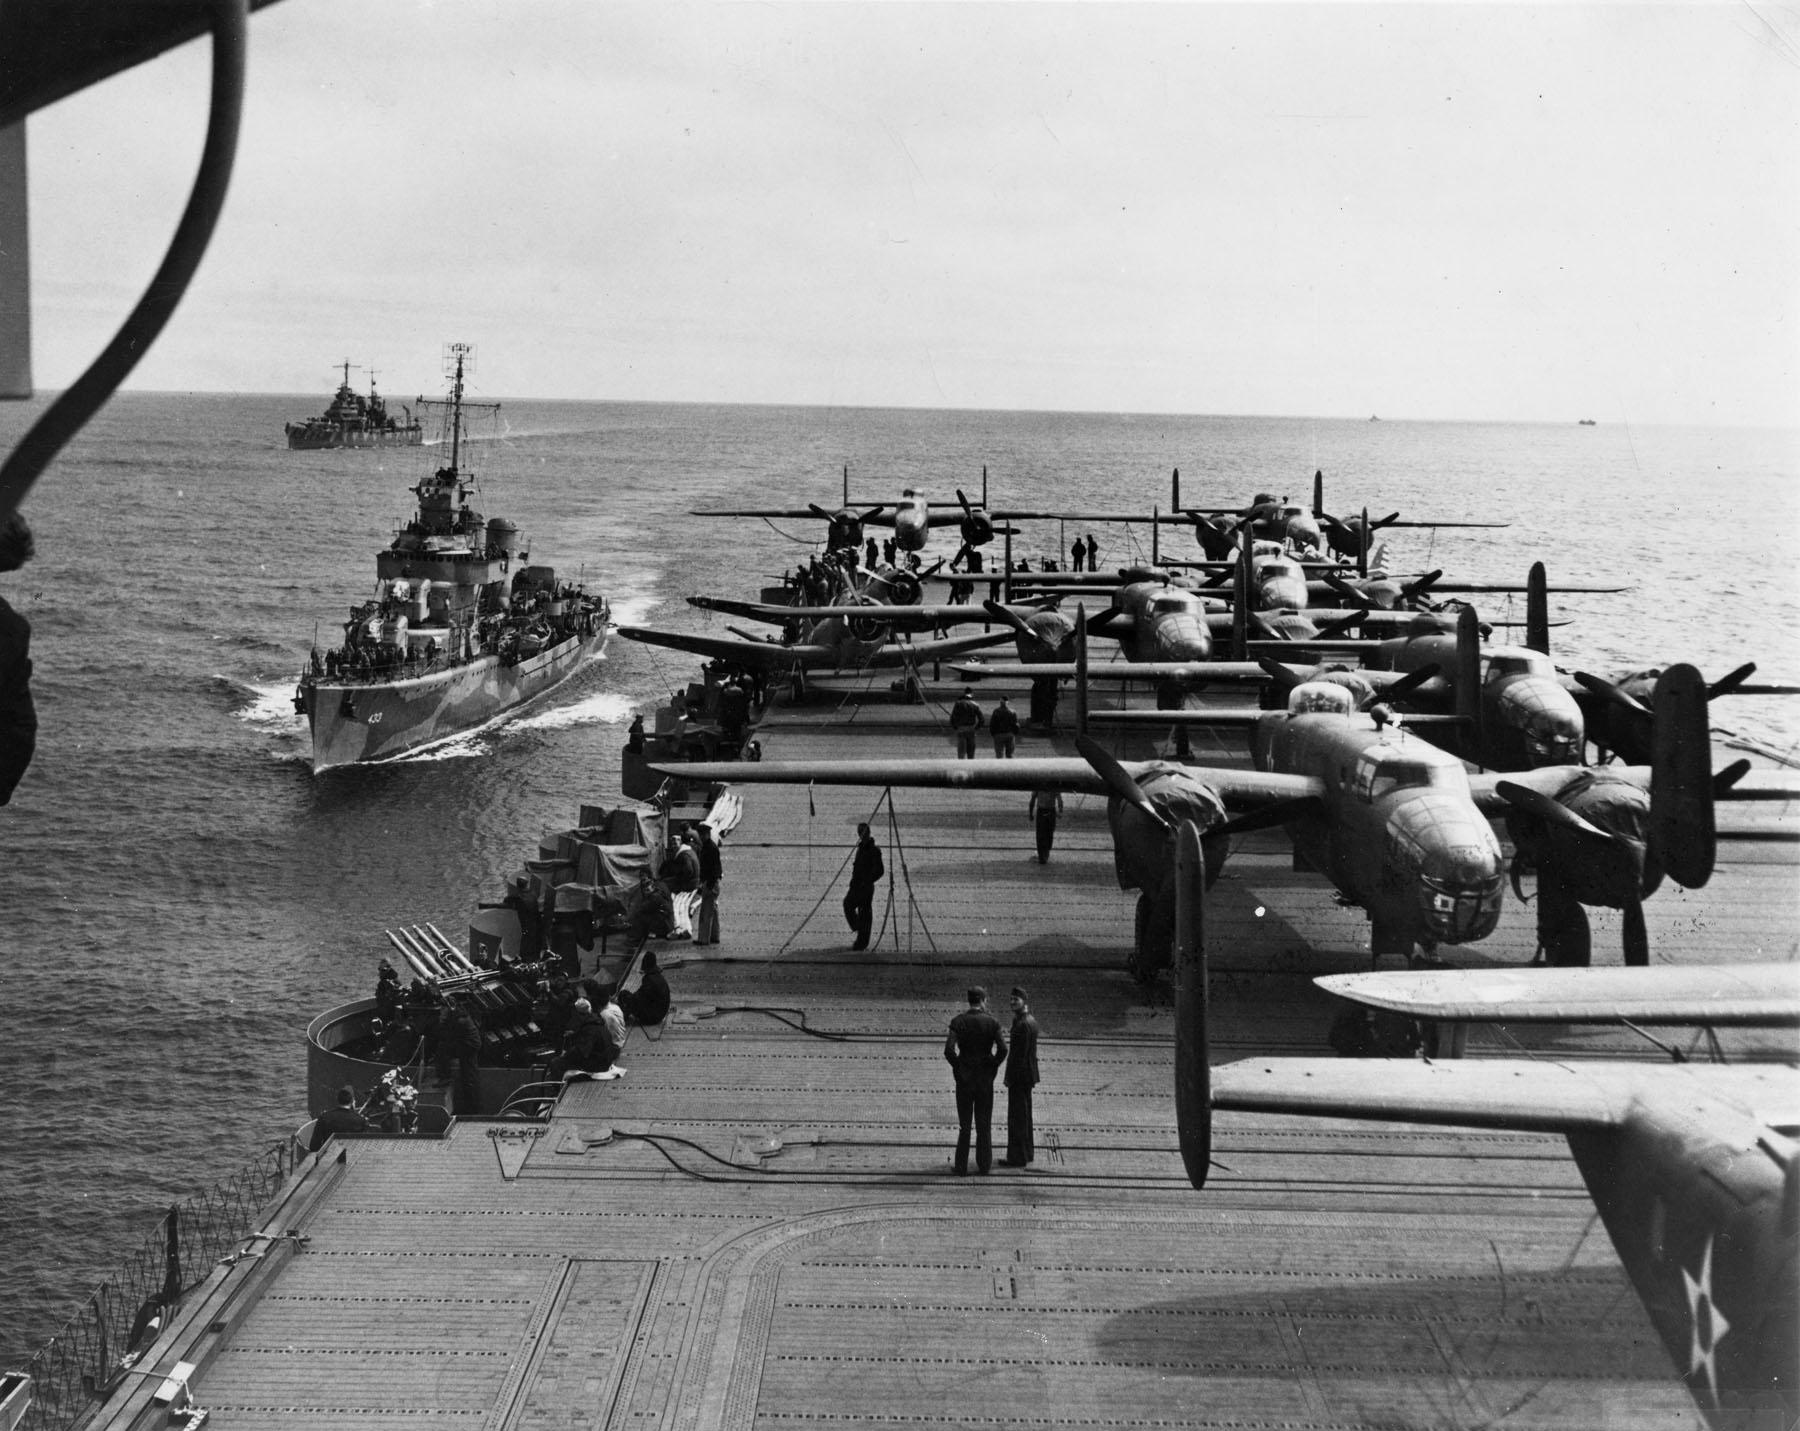 http://upload.wikimedia.org/wikipedia/commons/7/7c/USS_Hornet_%28CV-8%29_with_USS_Gwin_%28DD-433%29_during_Doolittle_Raid_1942.jpg